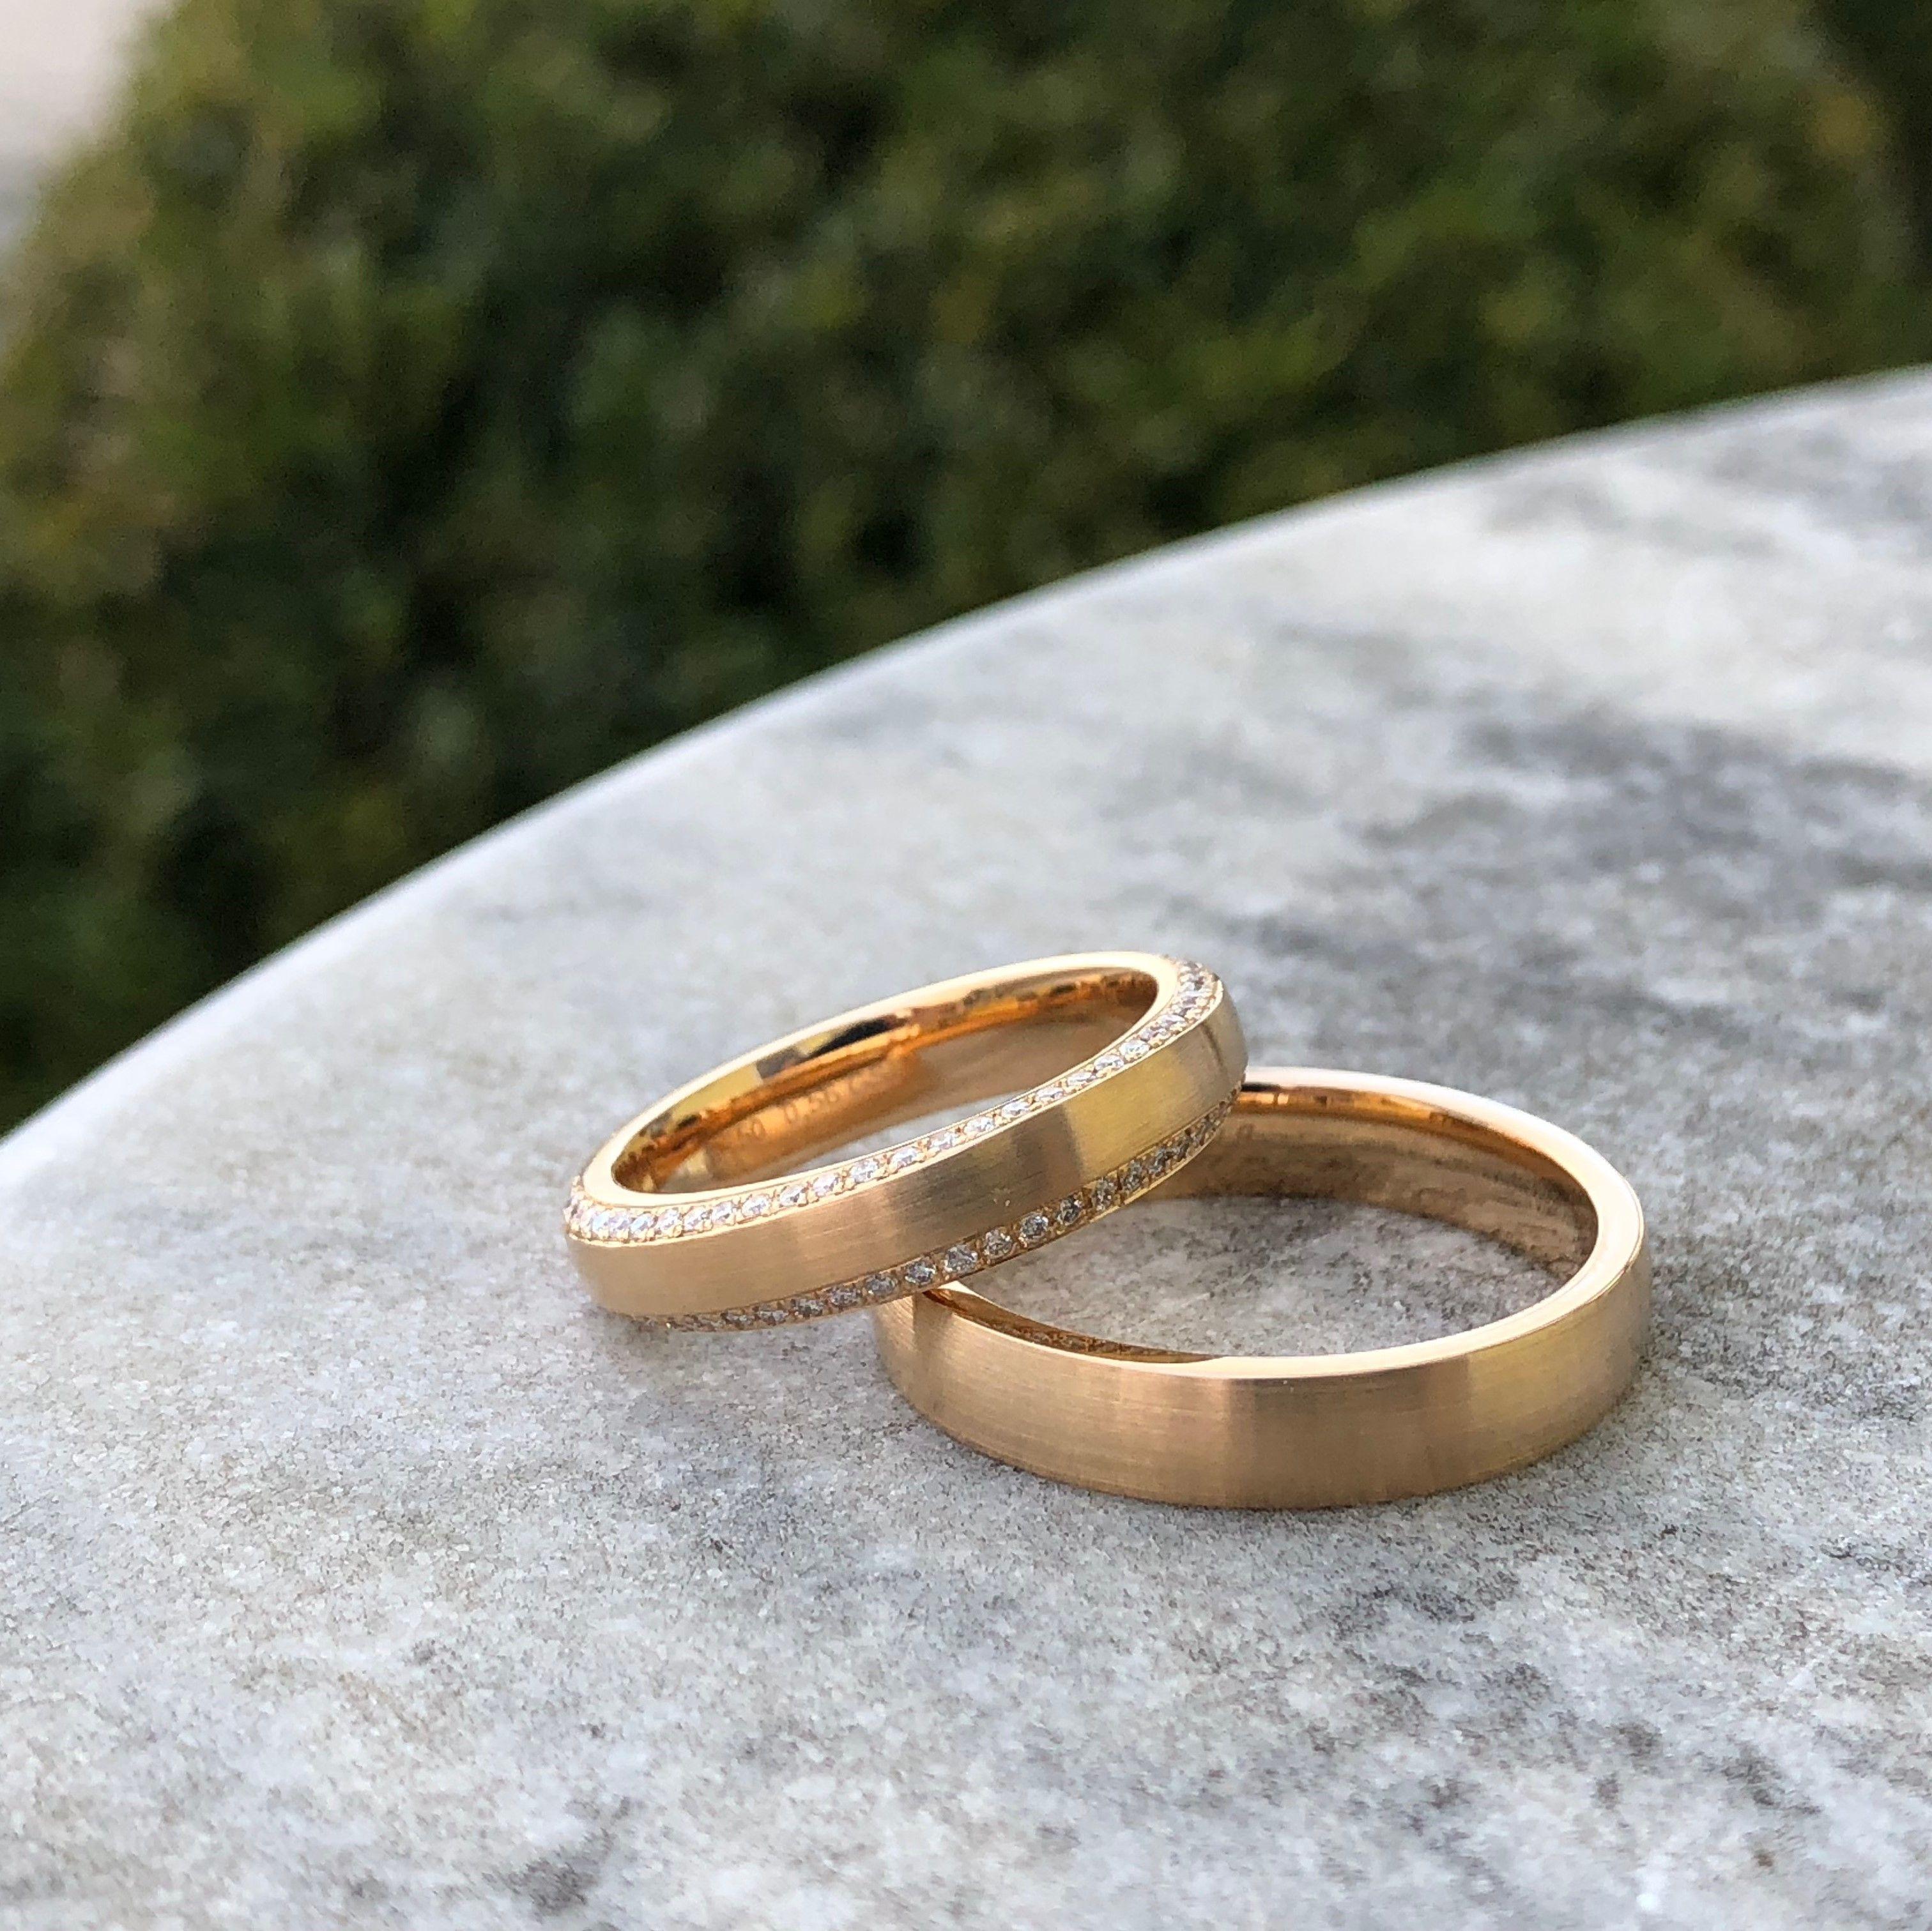 Brillante Apricotgold Trauringe Trauringe Einzigartige Trauringe Ring Verlobung